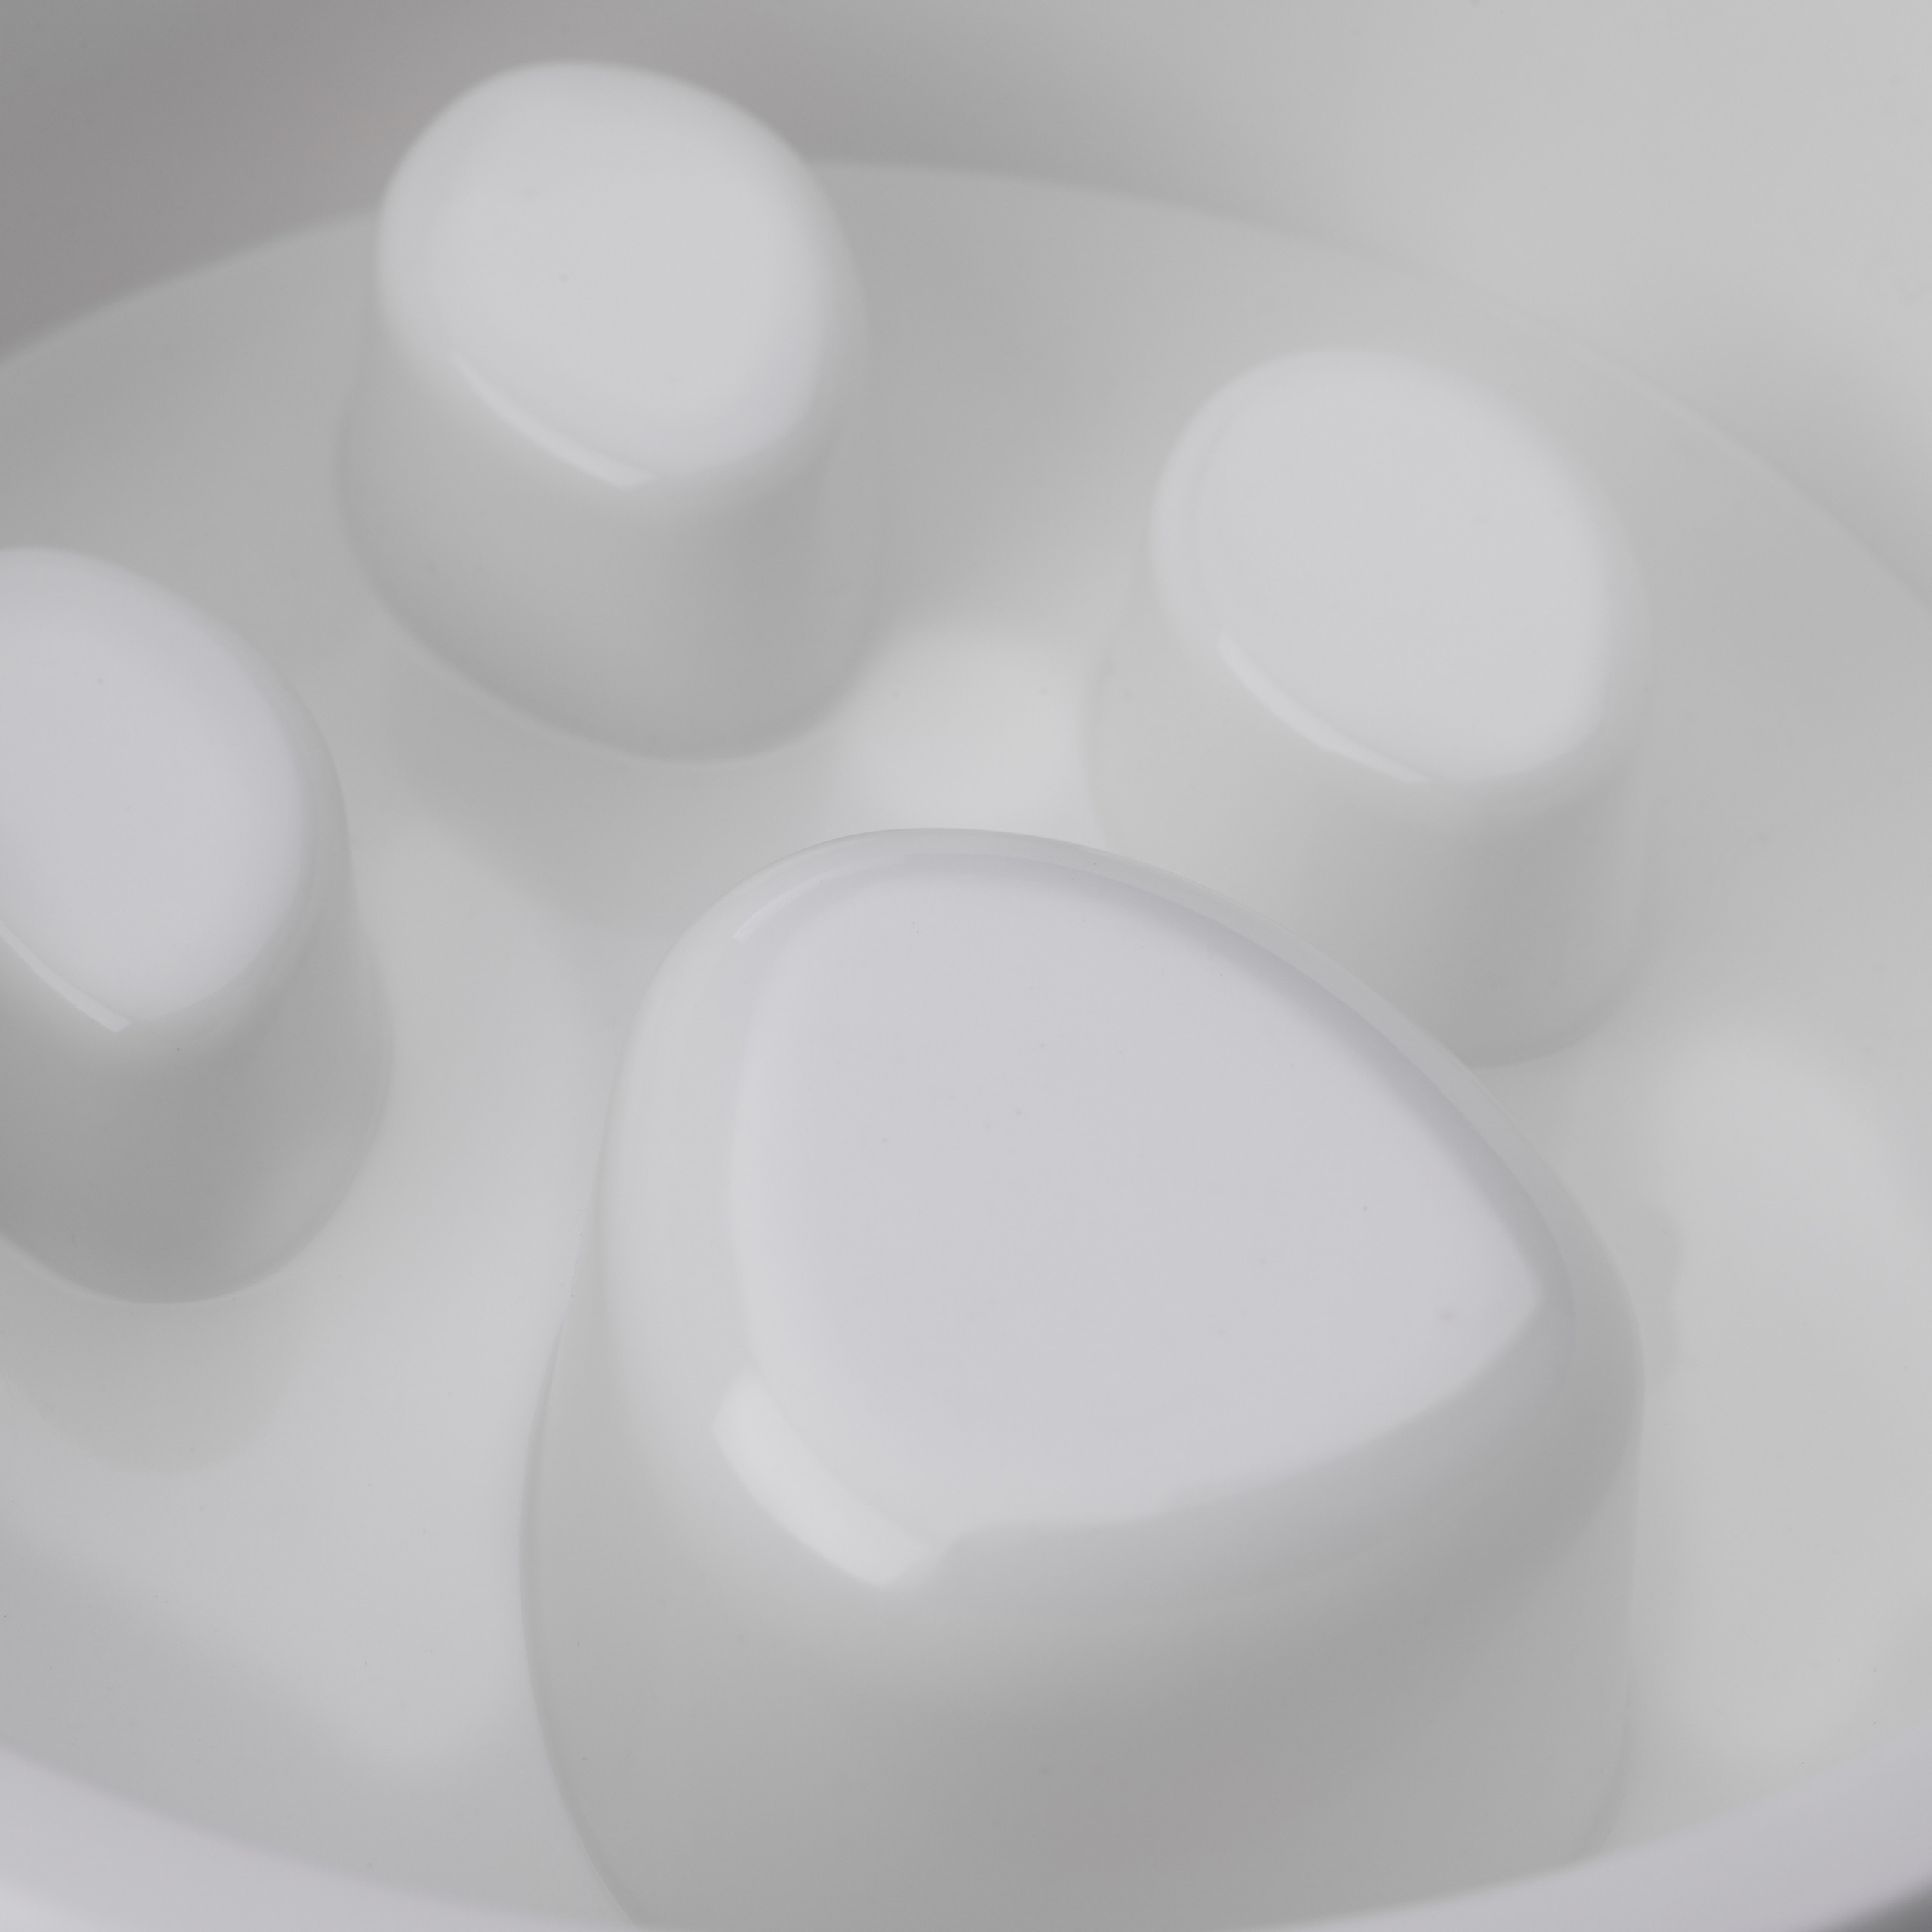 Indexbild 20 - Anti Schling Napf Hundenapf Großer Fressnapf Langsames Fressen Futternapf rund